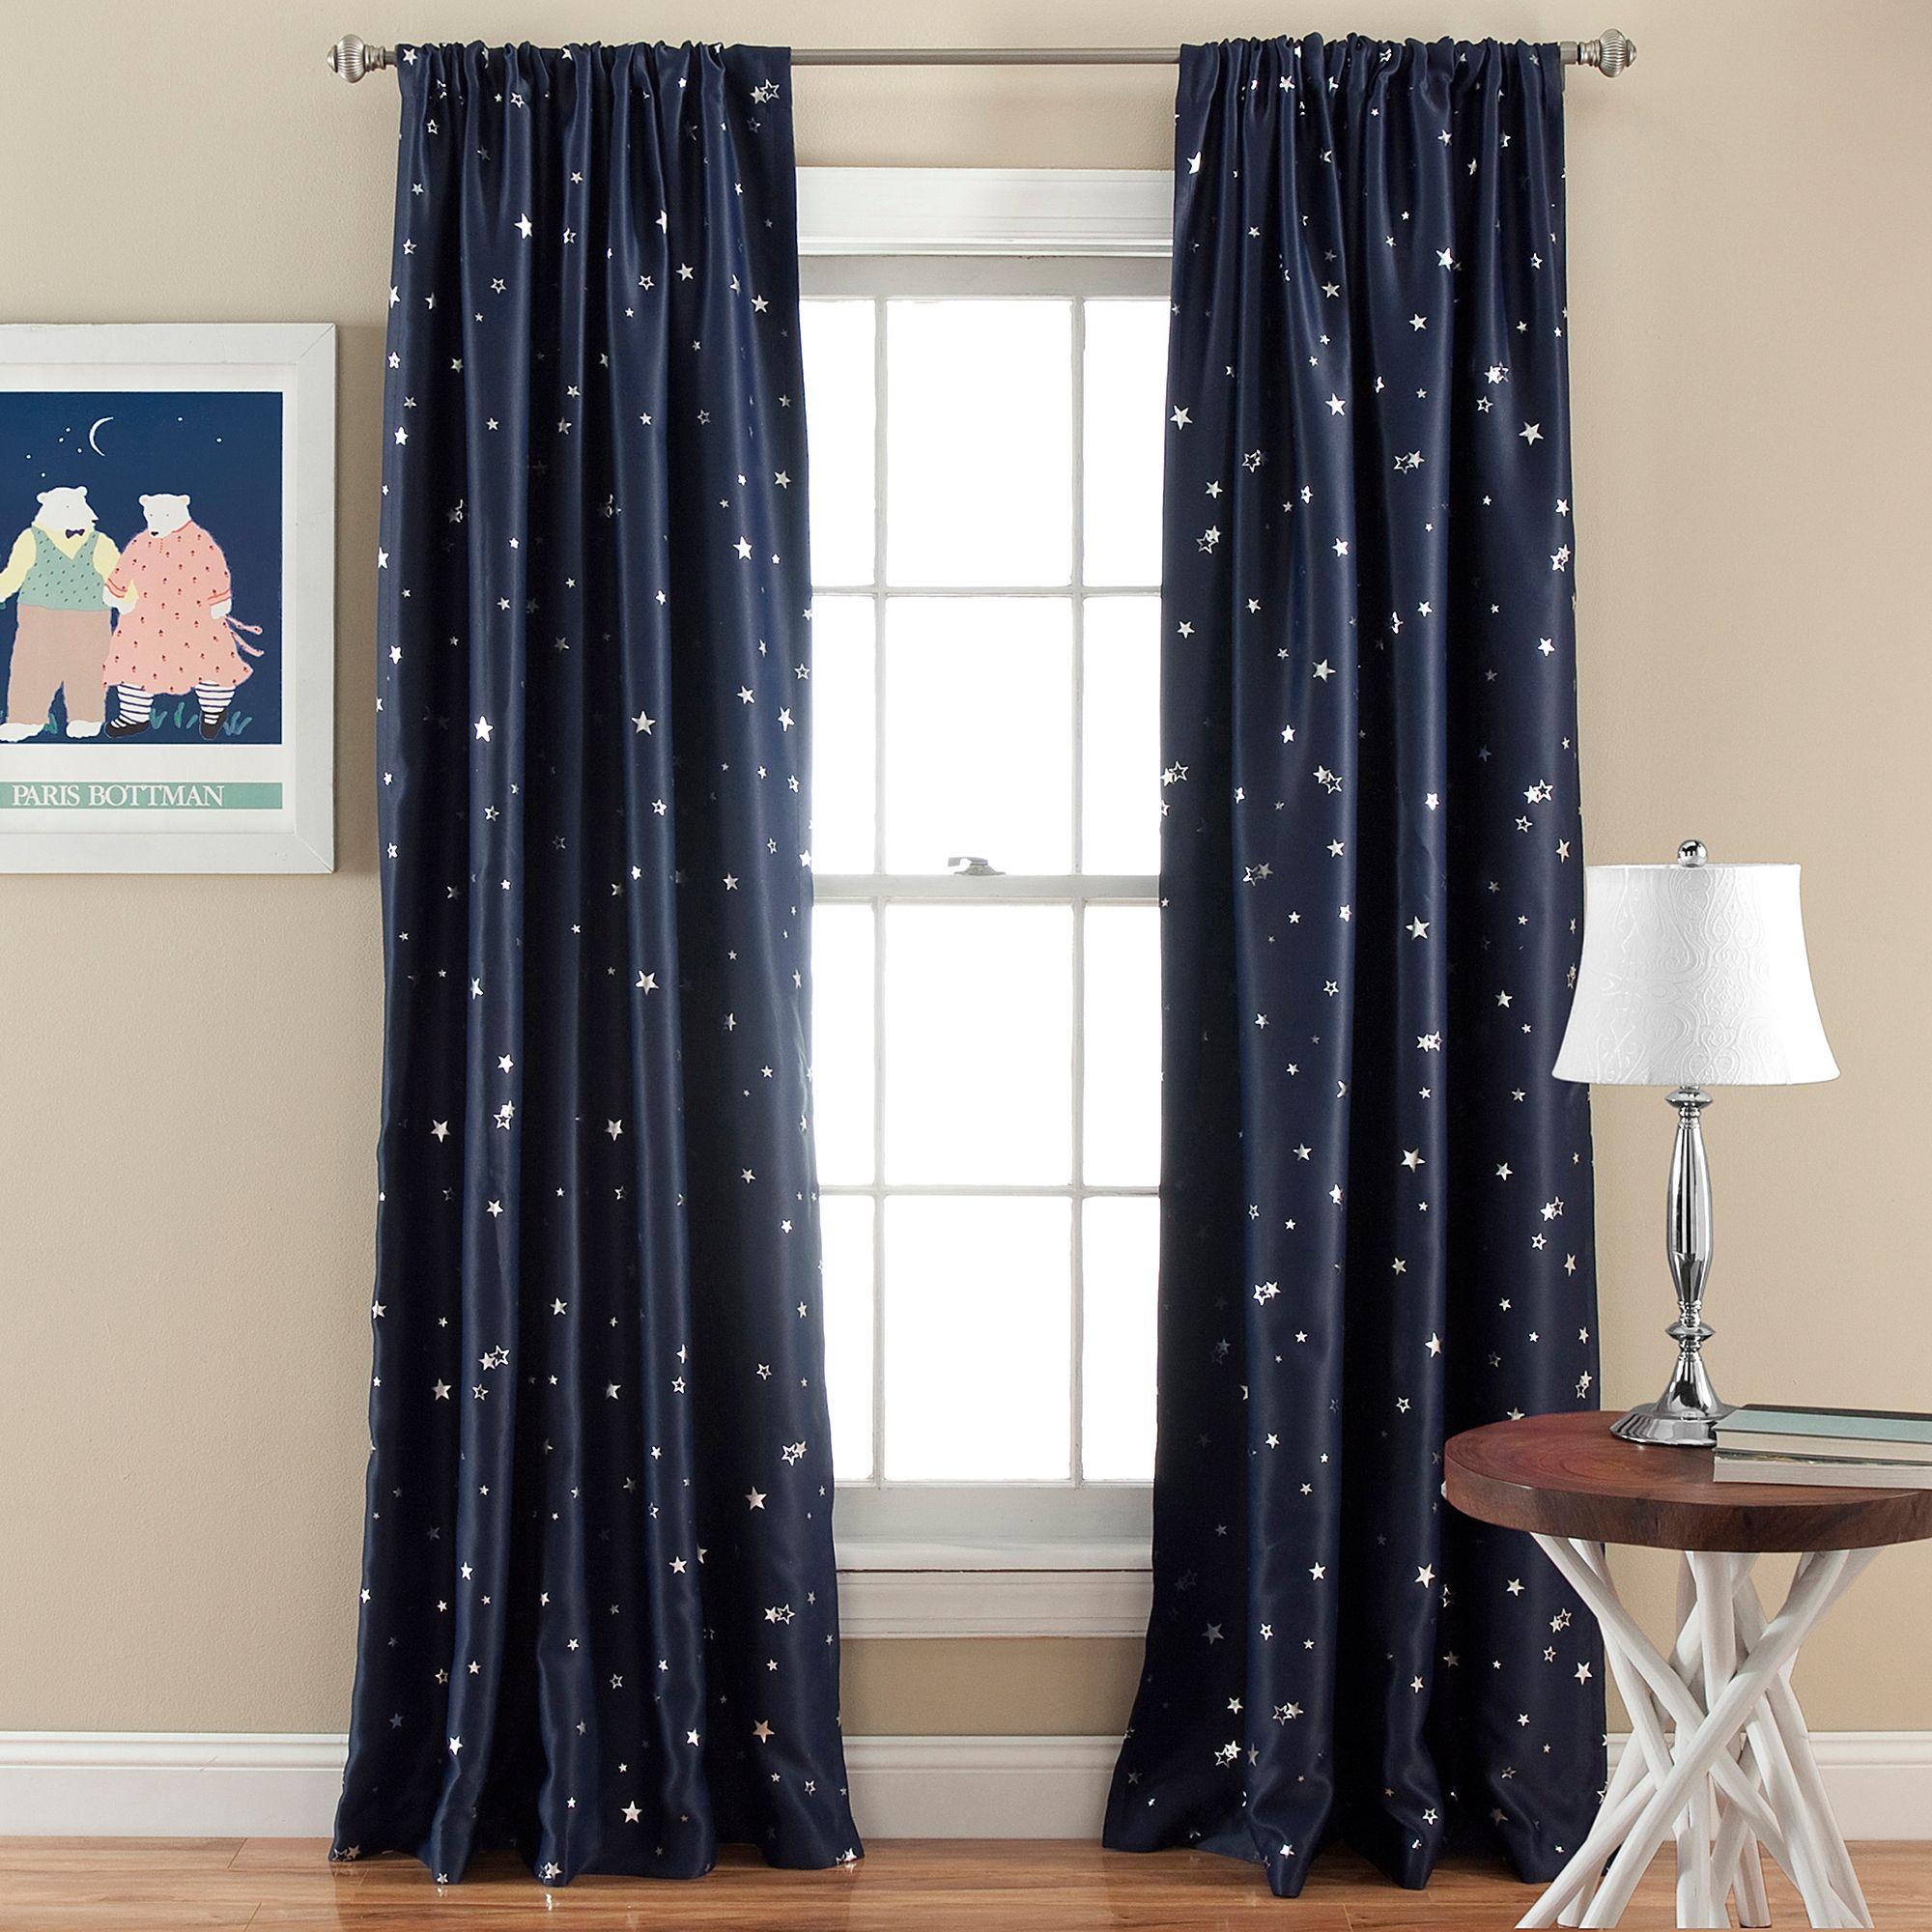 Lush Decor Star Blackout 84 Inch Rod Pocket Window Curtain Panel